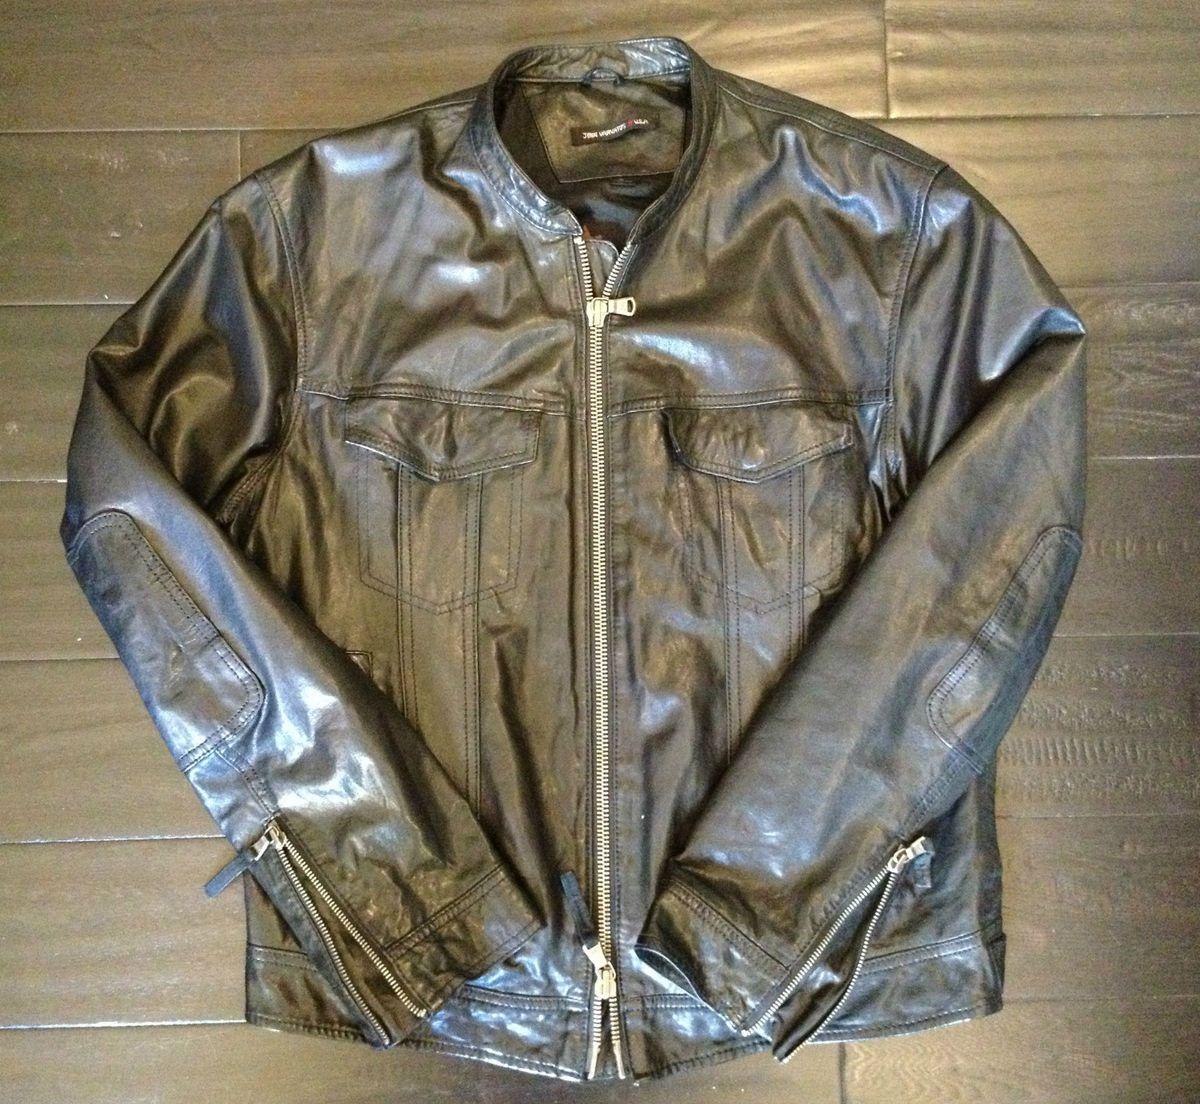 JOHN VARVATOS USA Mens Black Leather Motorcycle Racer Jacket Size M 998